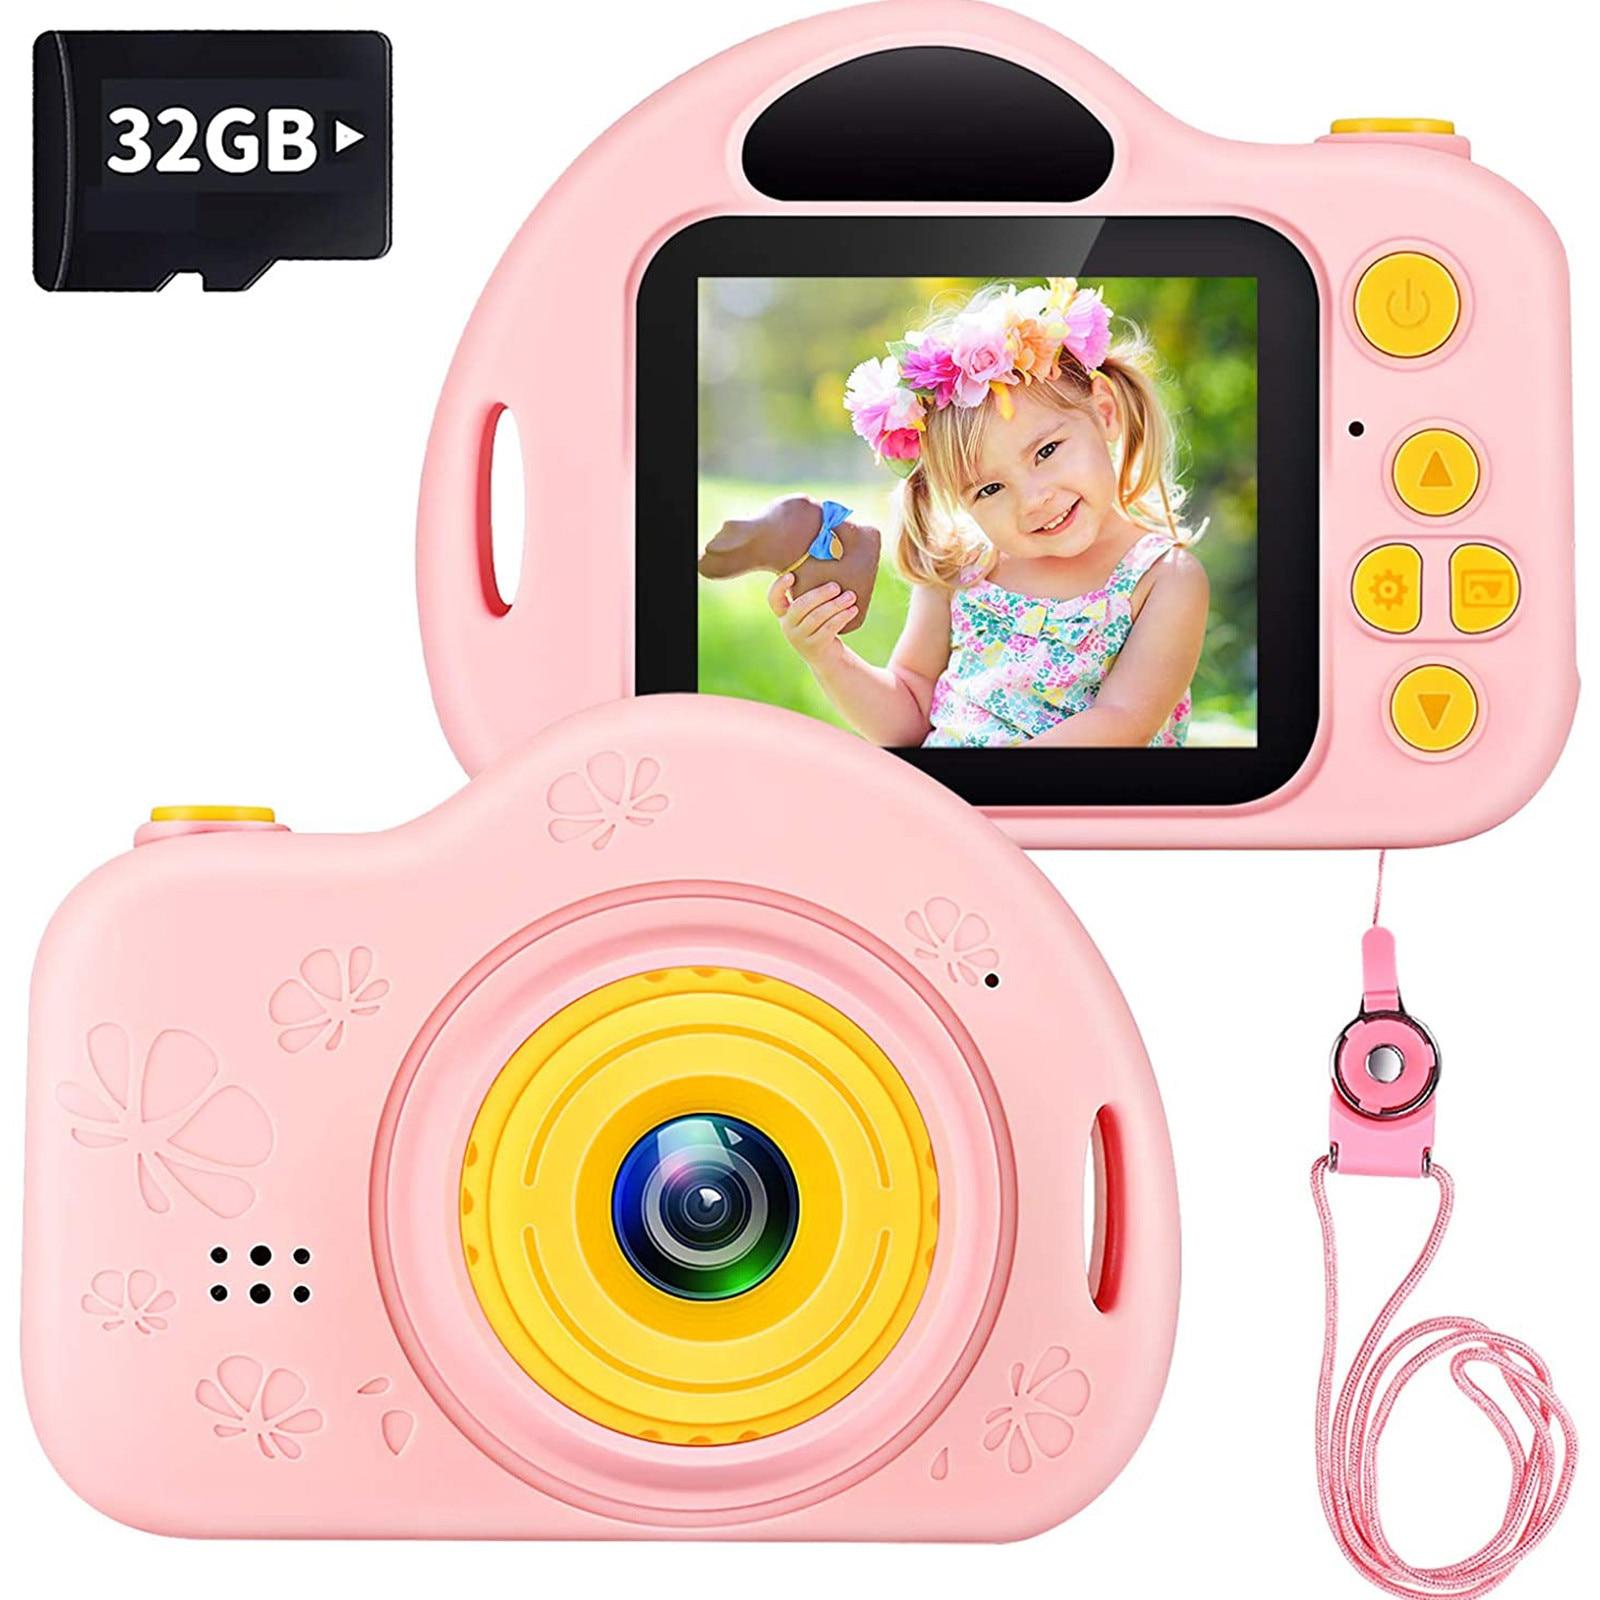 #5 New Electronic Camera Kids Digital Camera Toys For Girls 1080 Ips 2 Inch Hd Girls Best Birthday Toys Children Birthday Gift